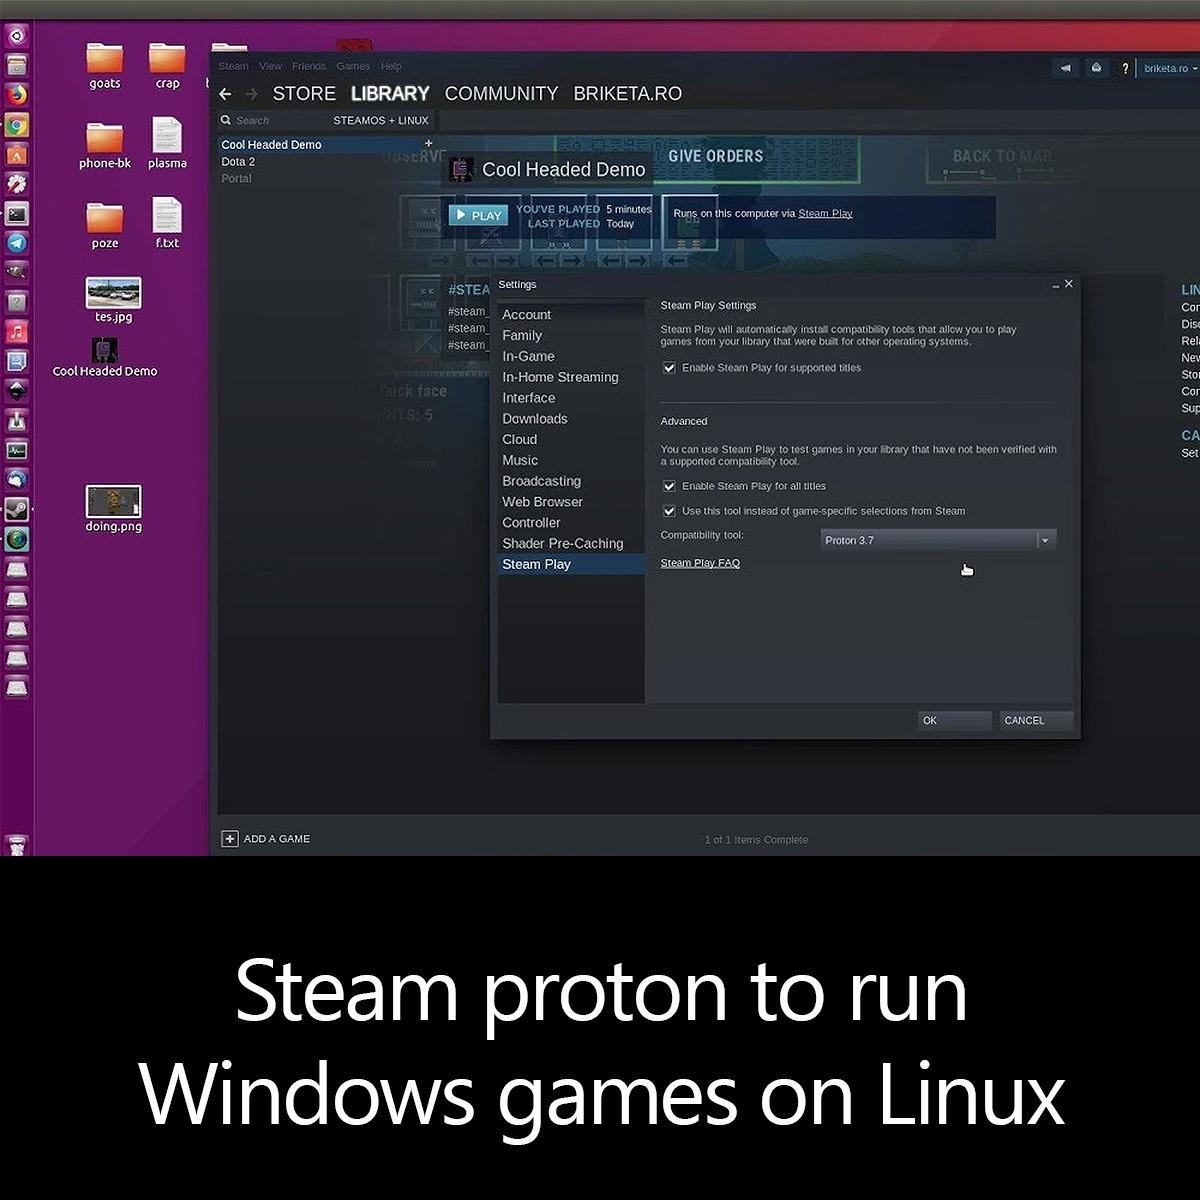 Steam proton to run Windows games on Linux